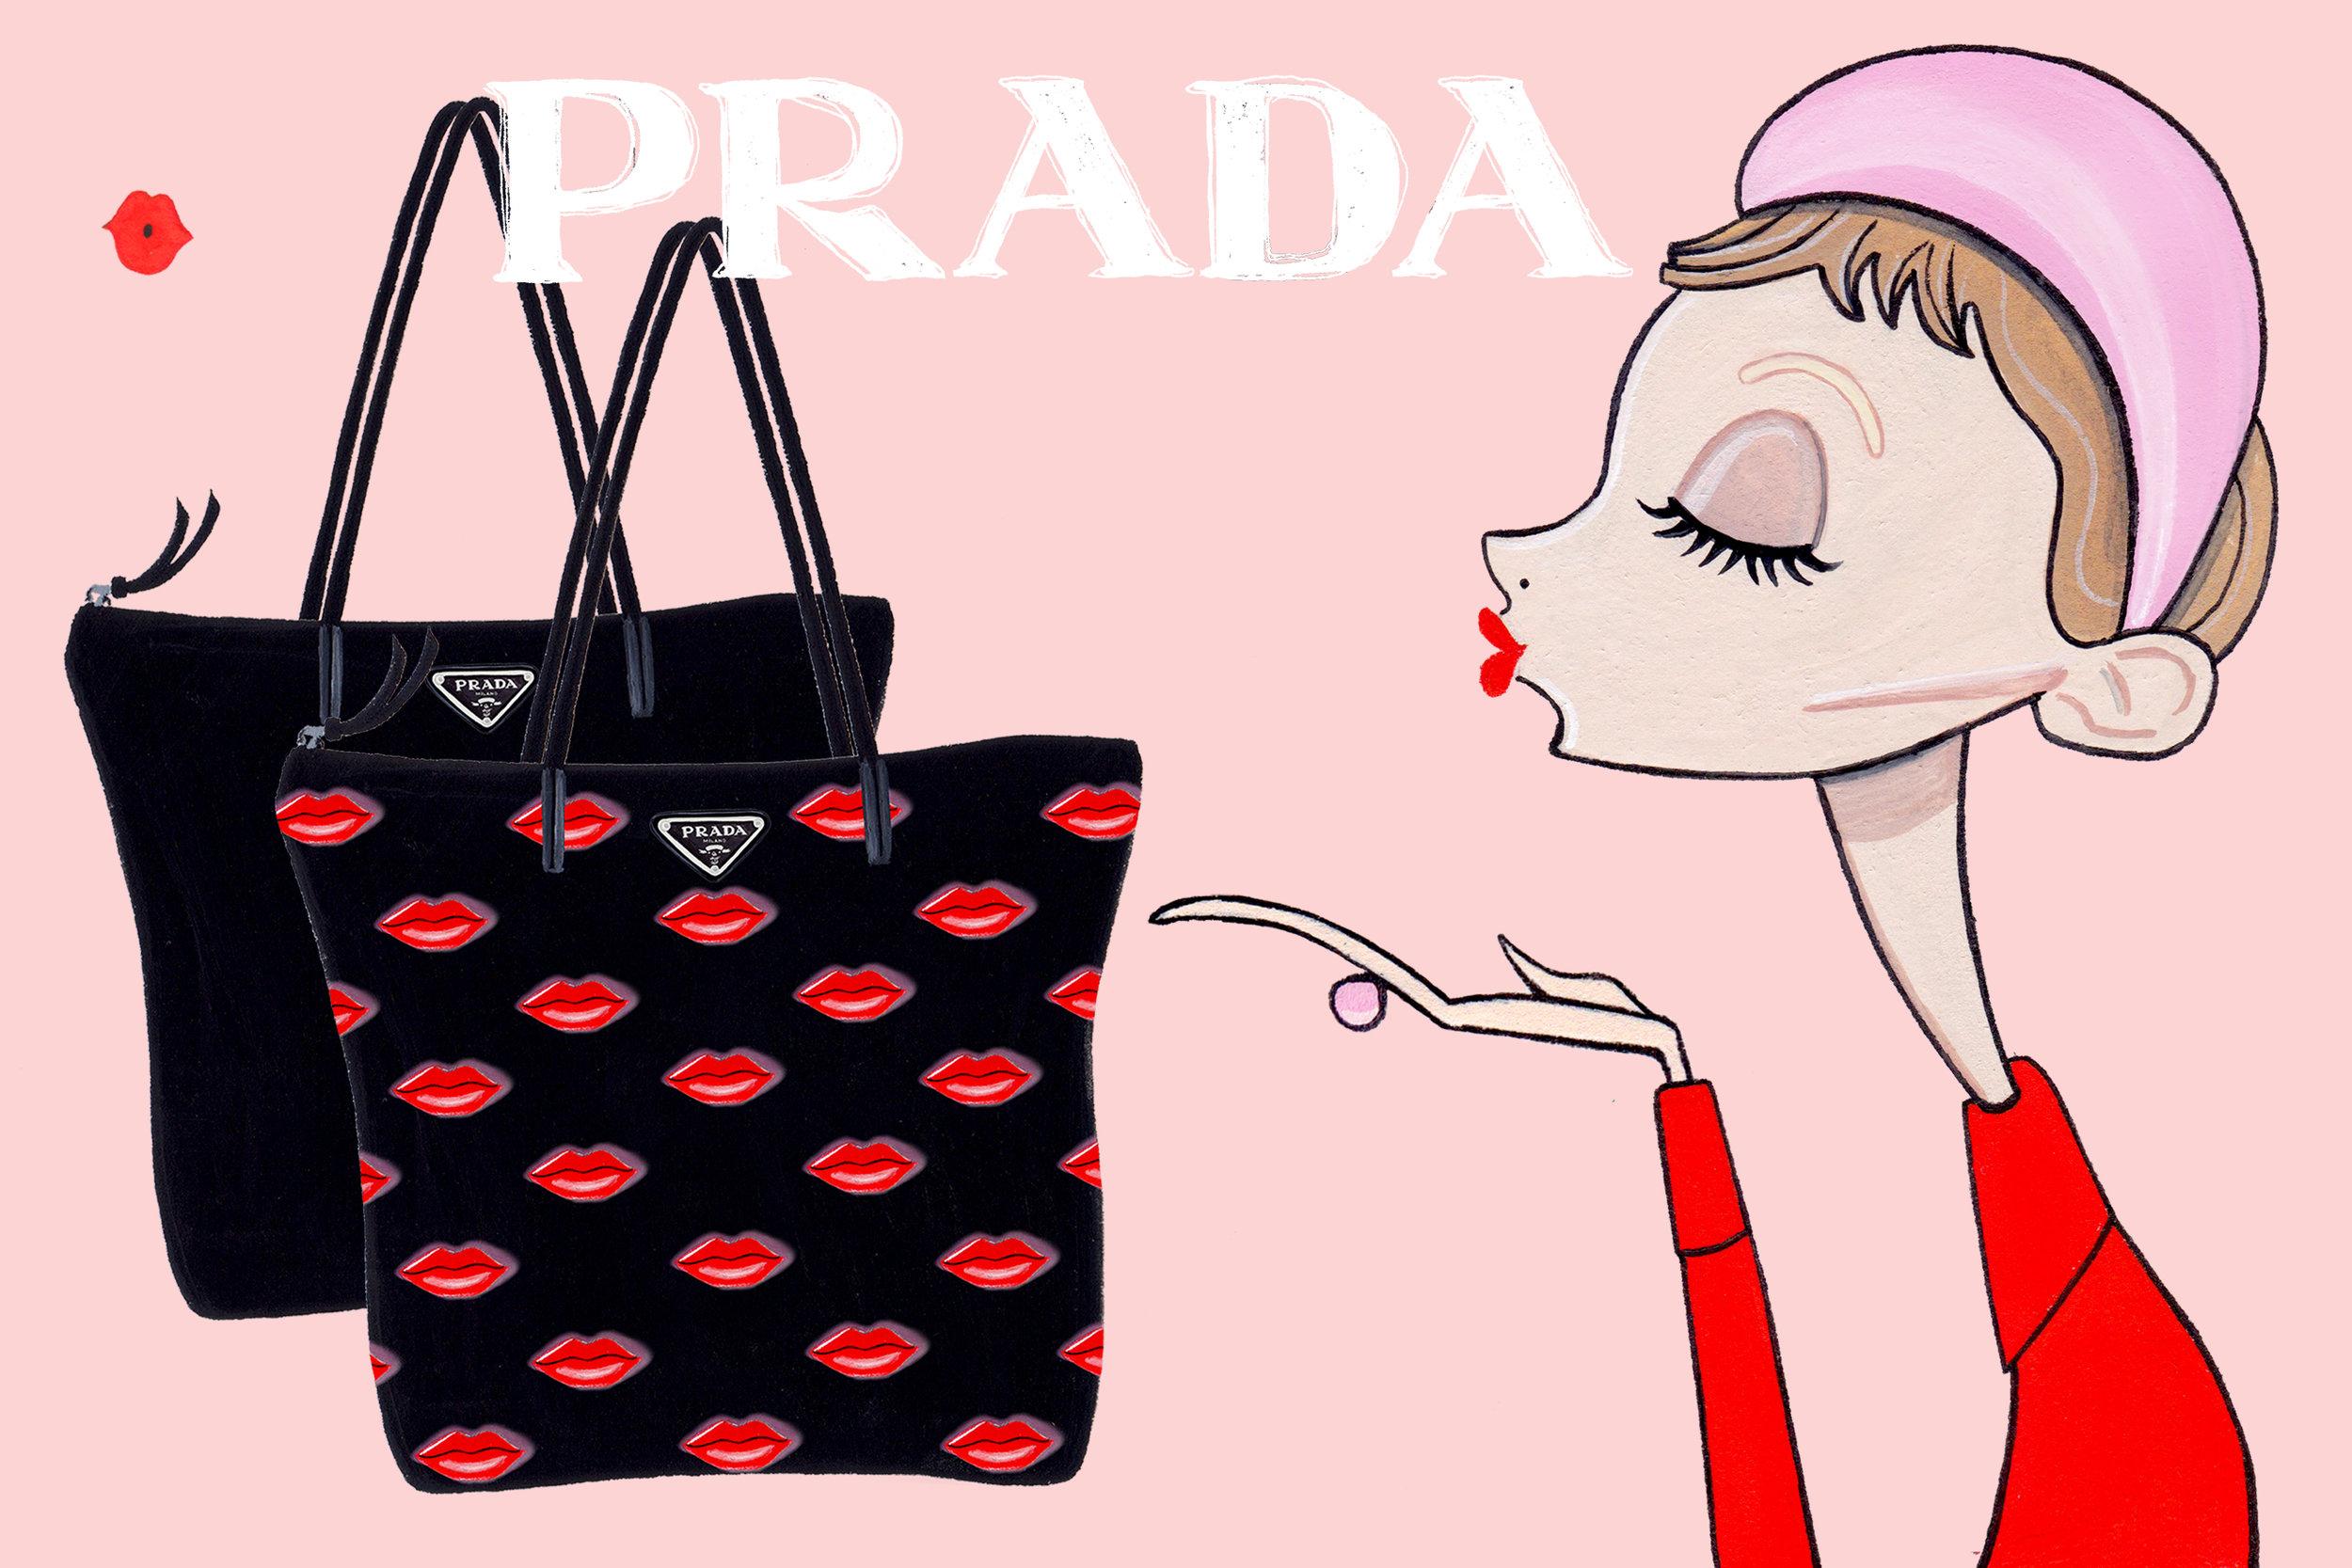 PRADA Valentine's Day 2019, Advertising Campaign